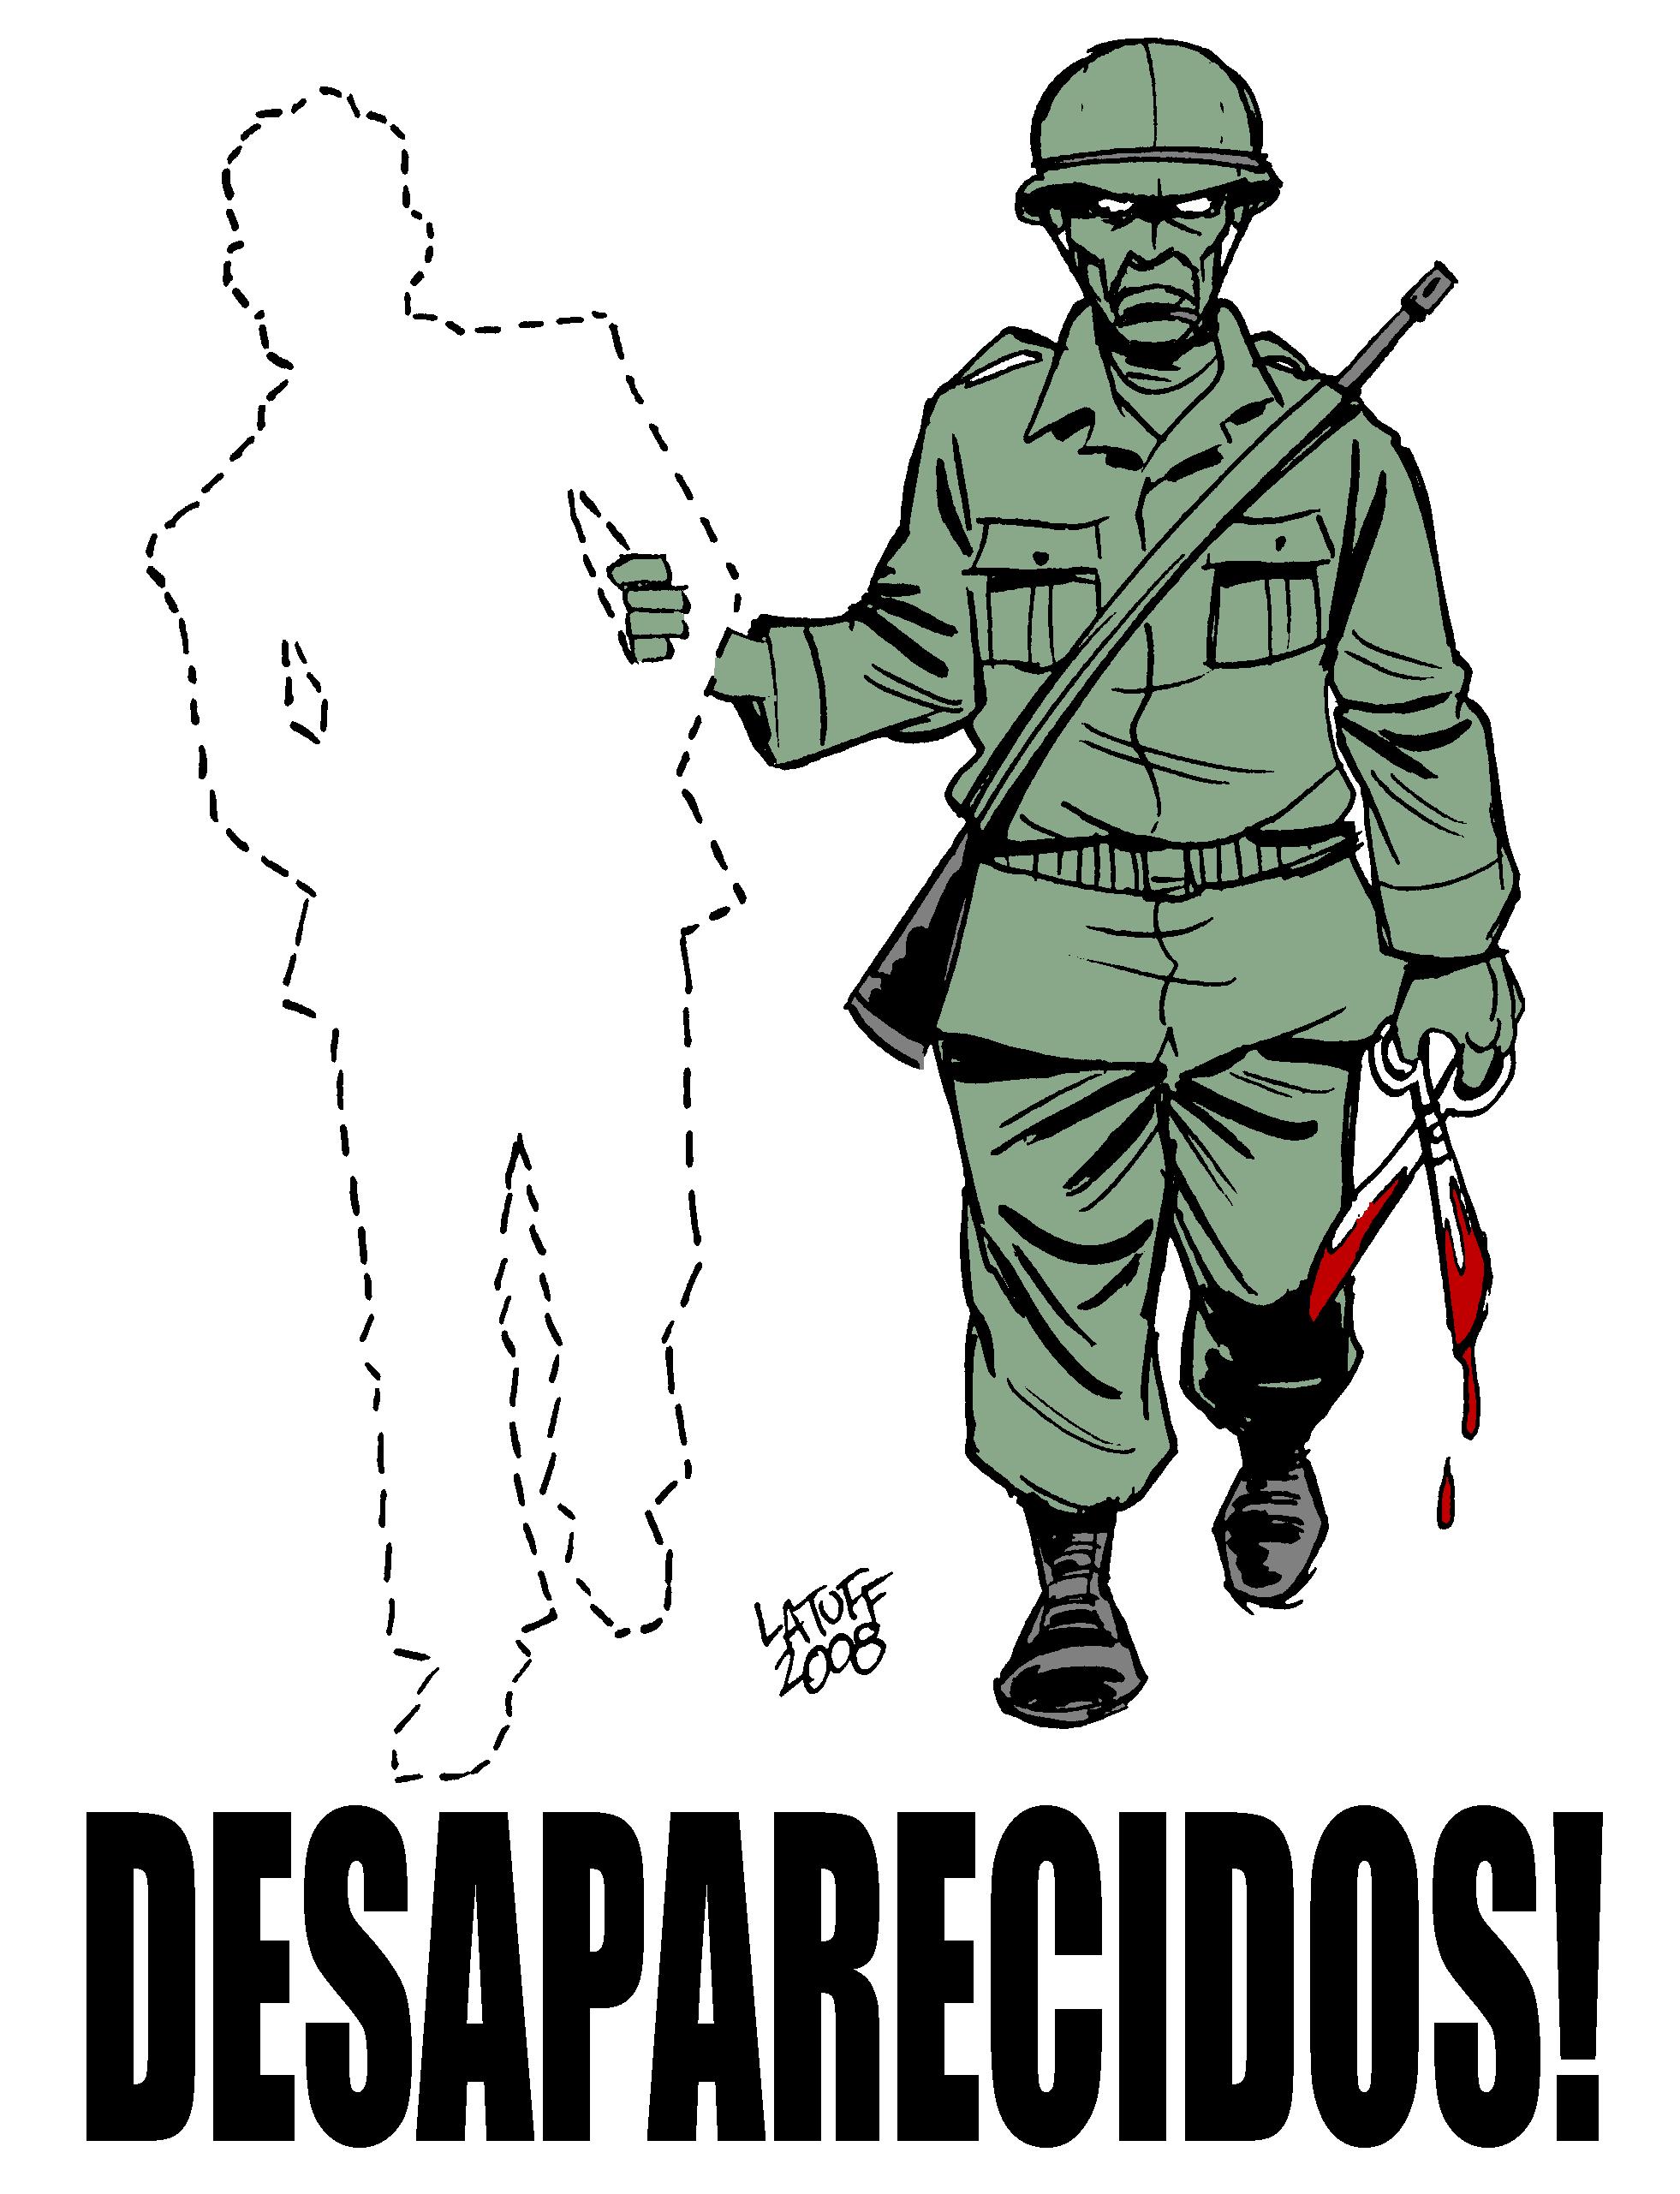 File:Desaparecidos.png - Wikimedia Commons